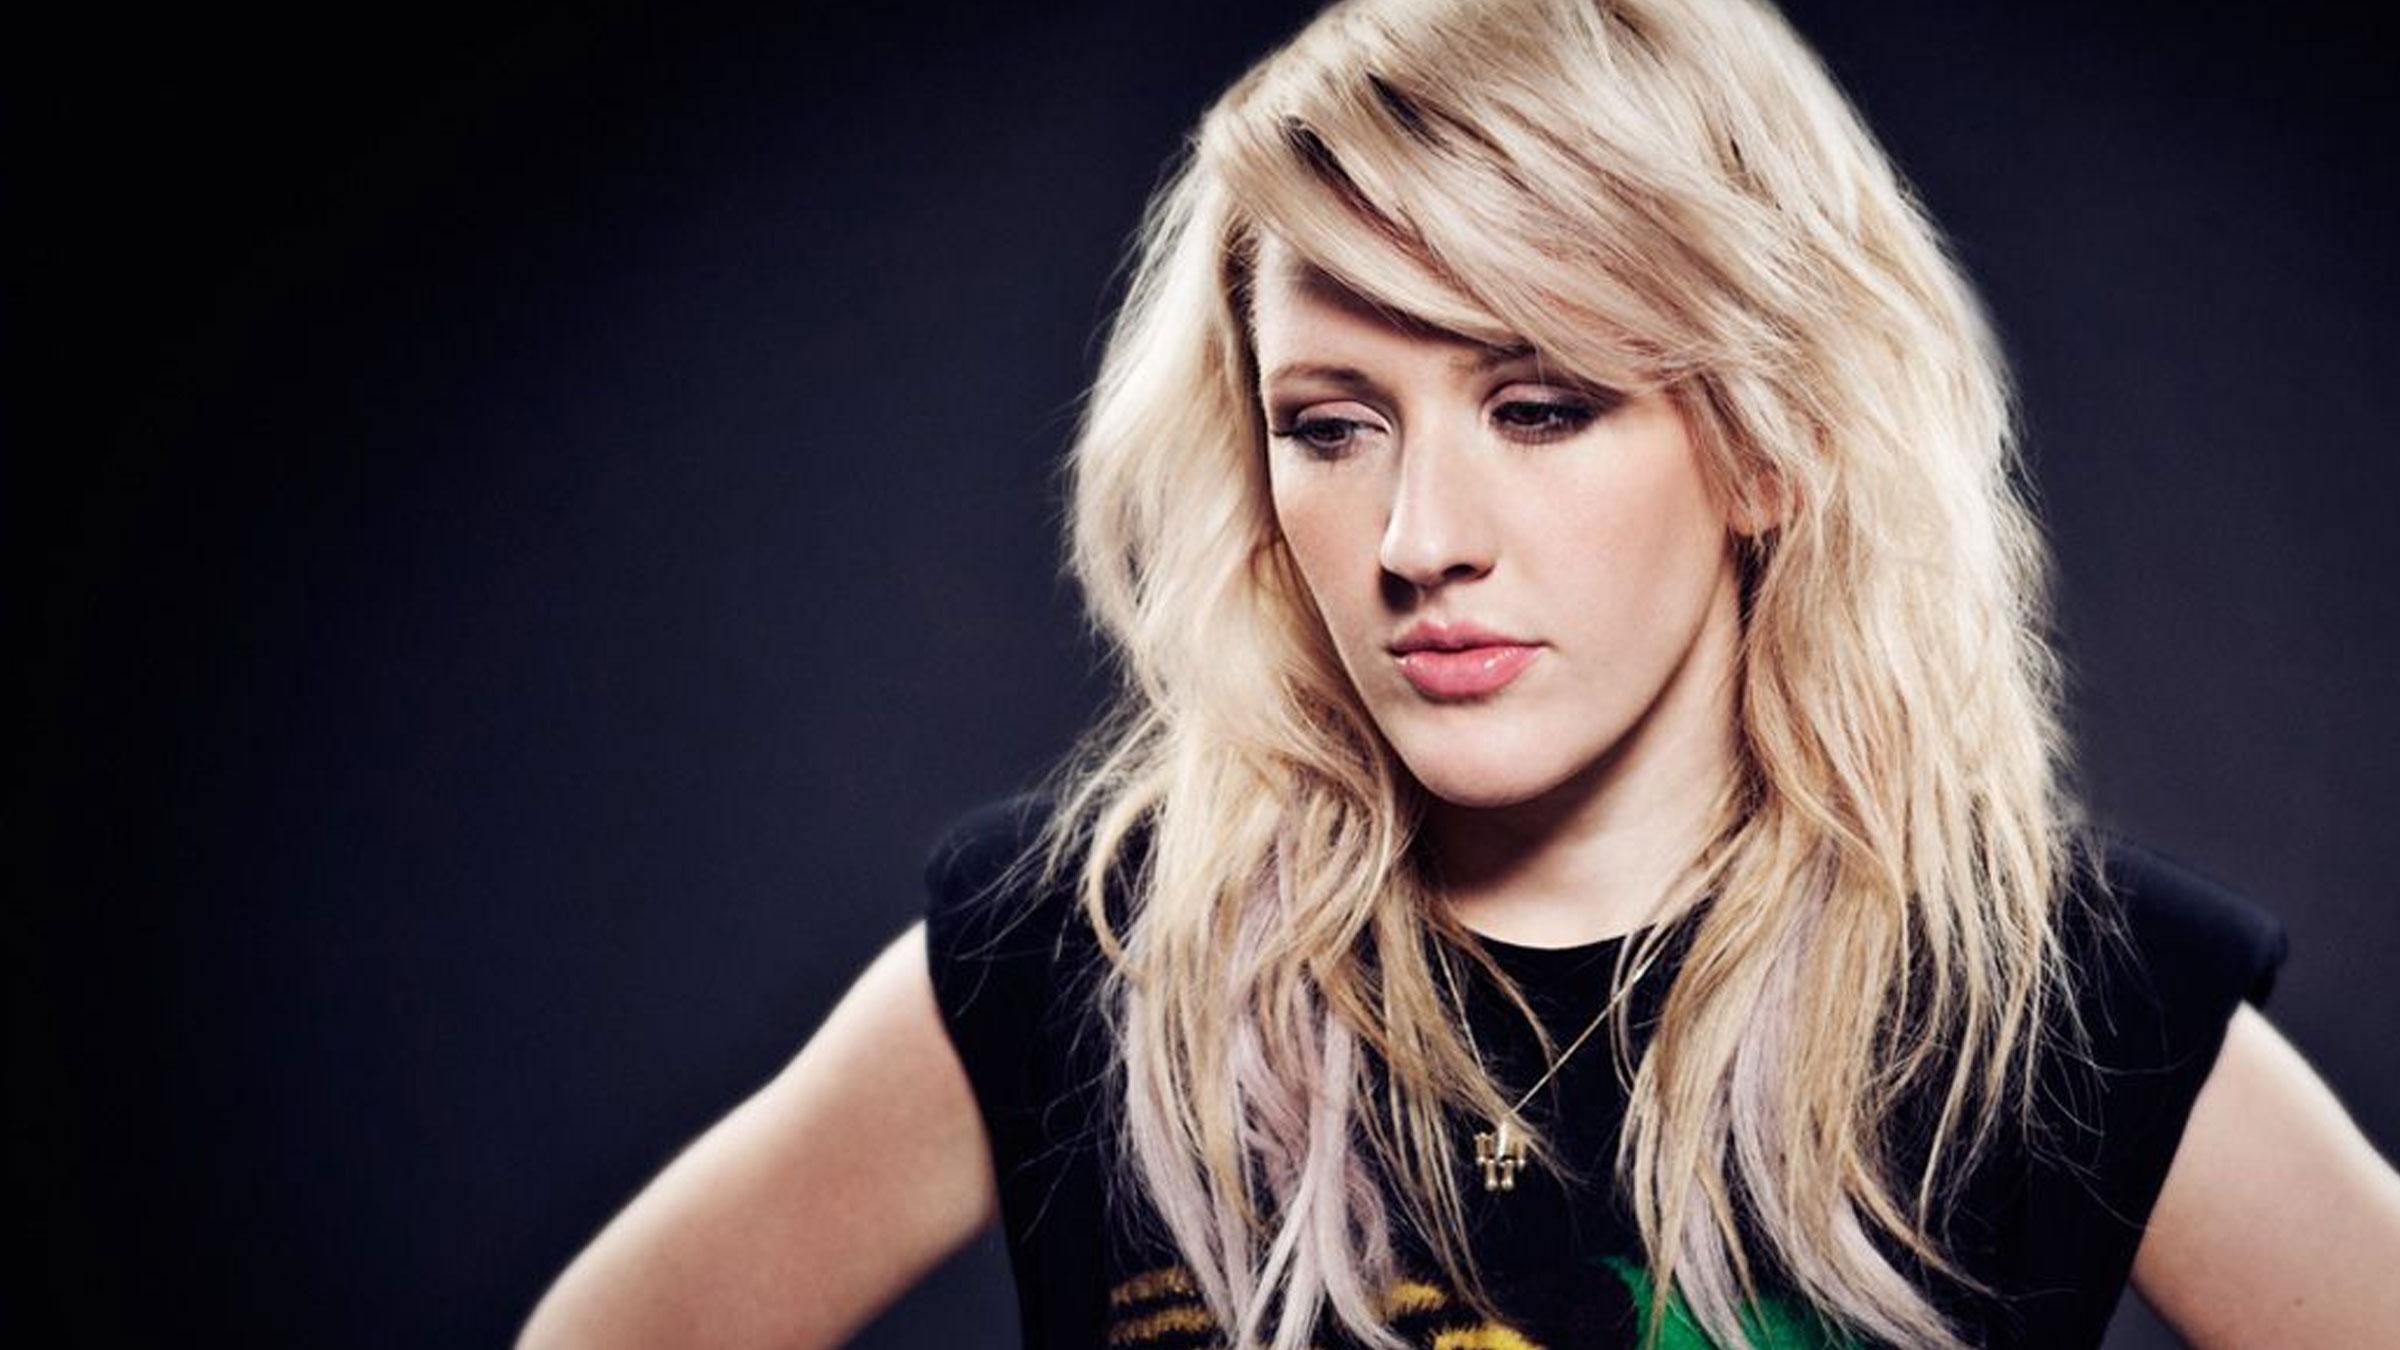 Ellie topgear teaser